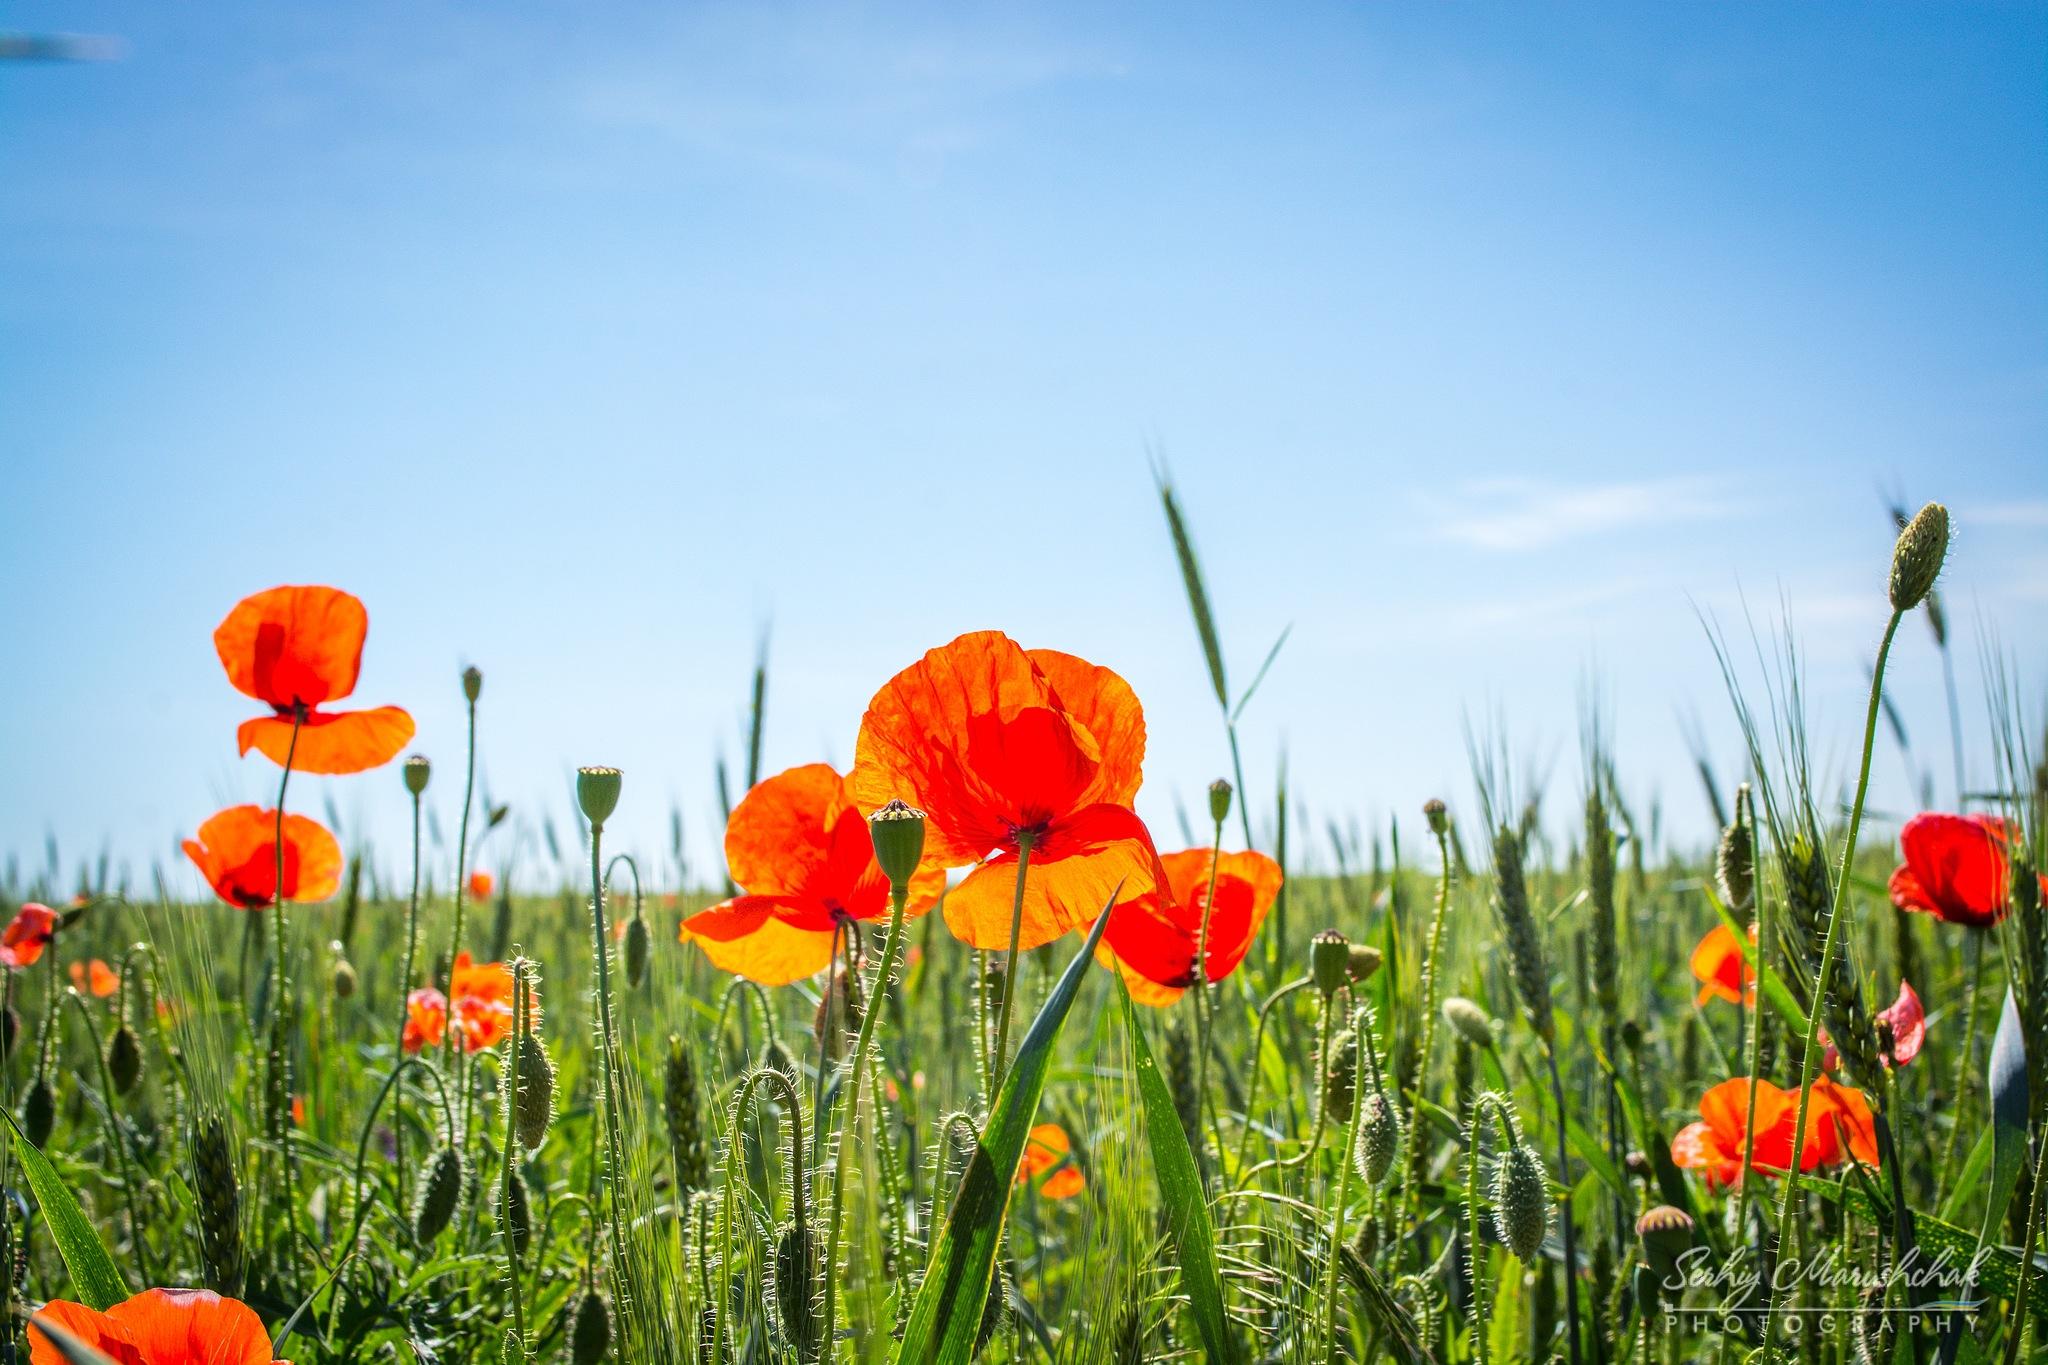 Маки під сонцем... / Poppies under the sun... by artmars07